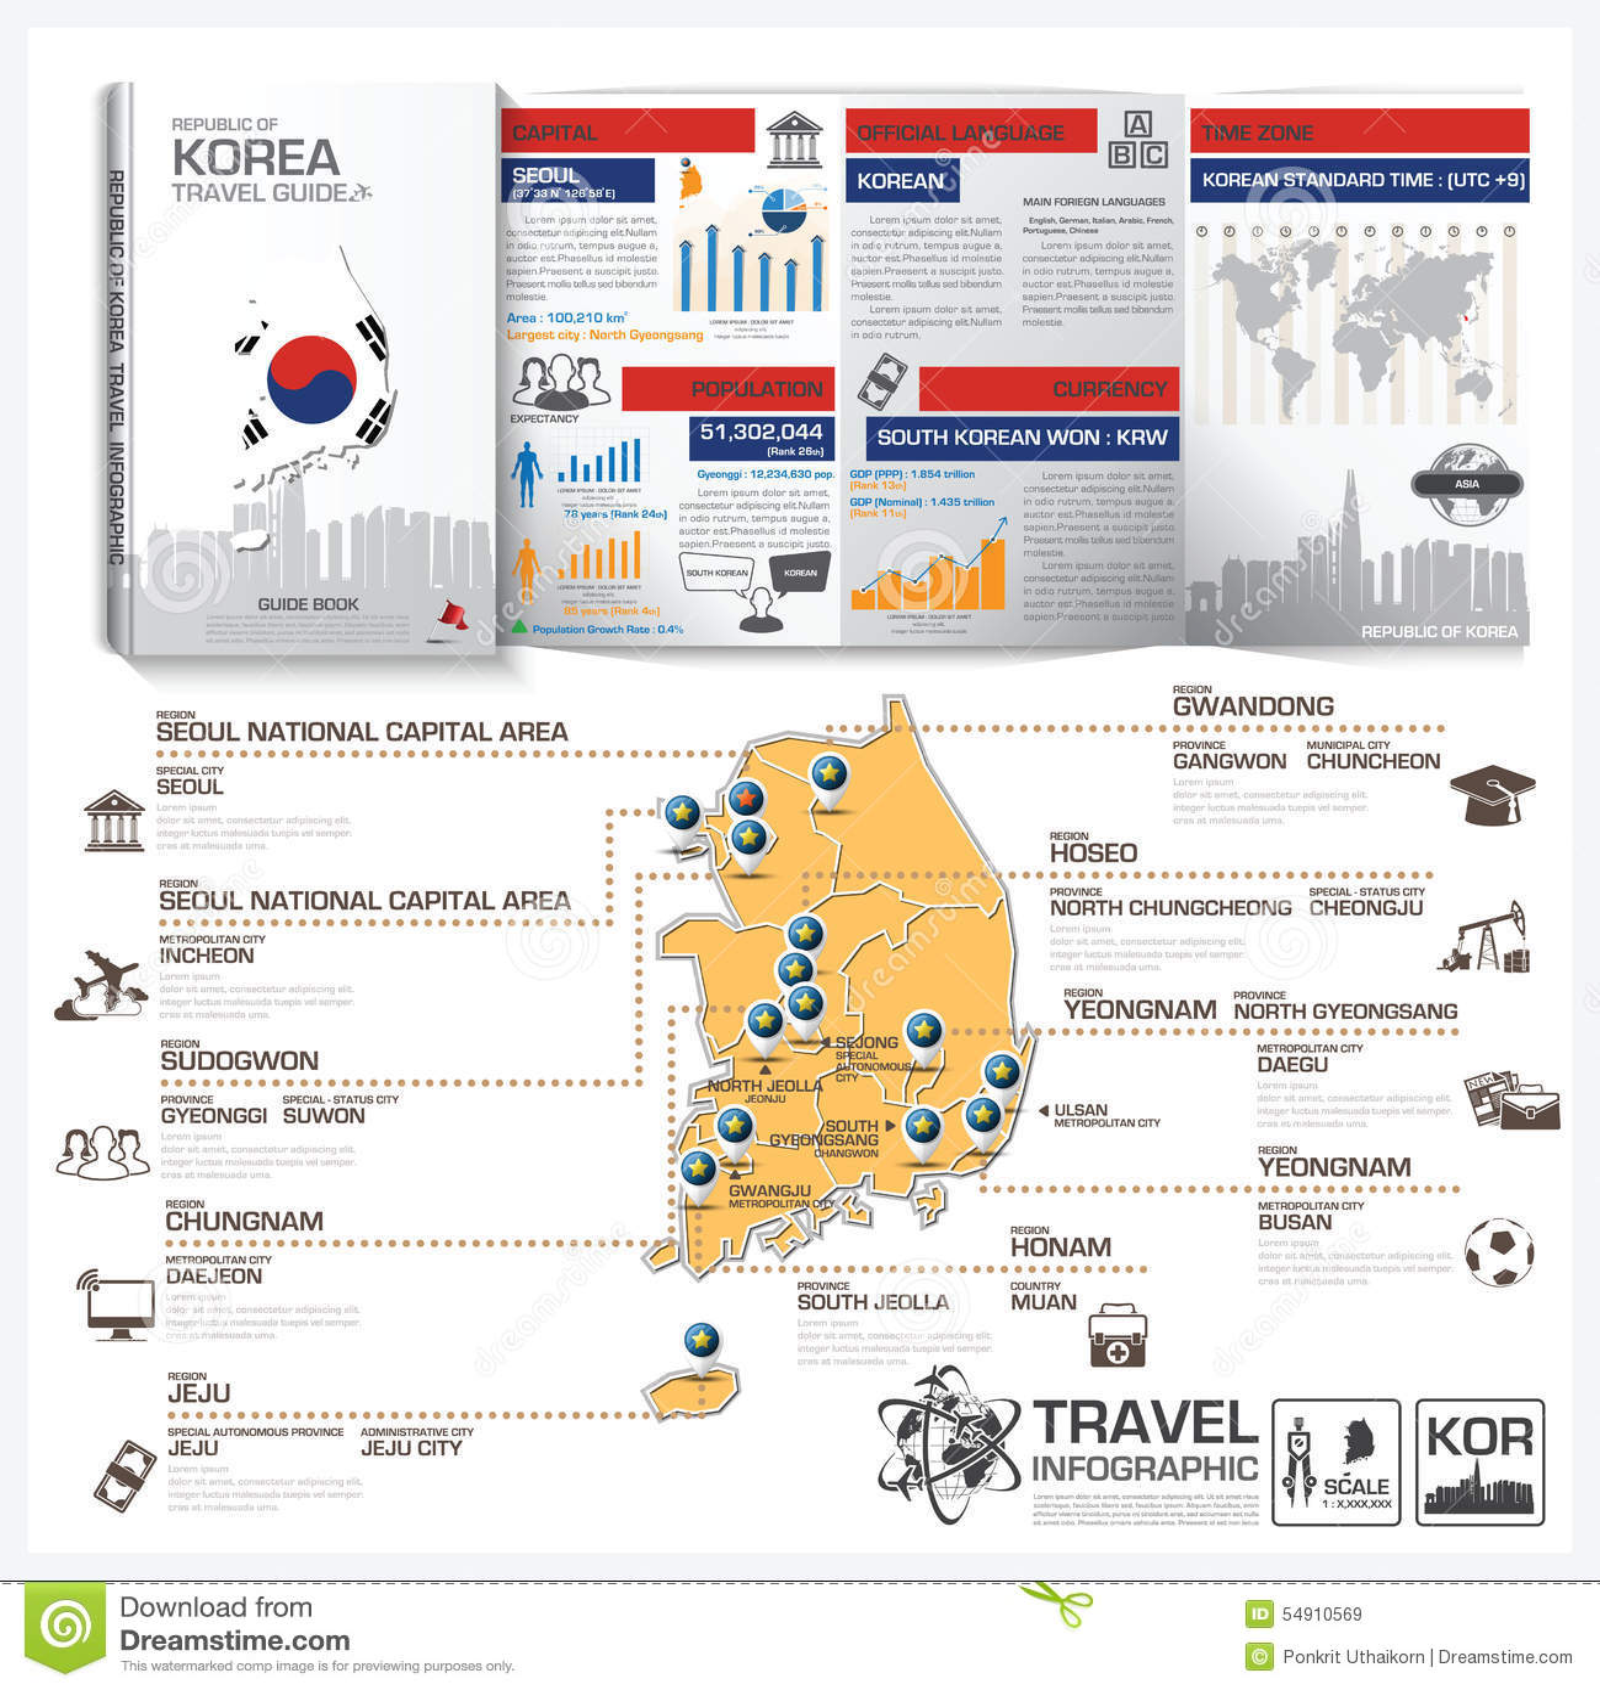 Guide Book: Republic Of Korea Travel Guide Book Business Infographic